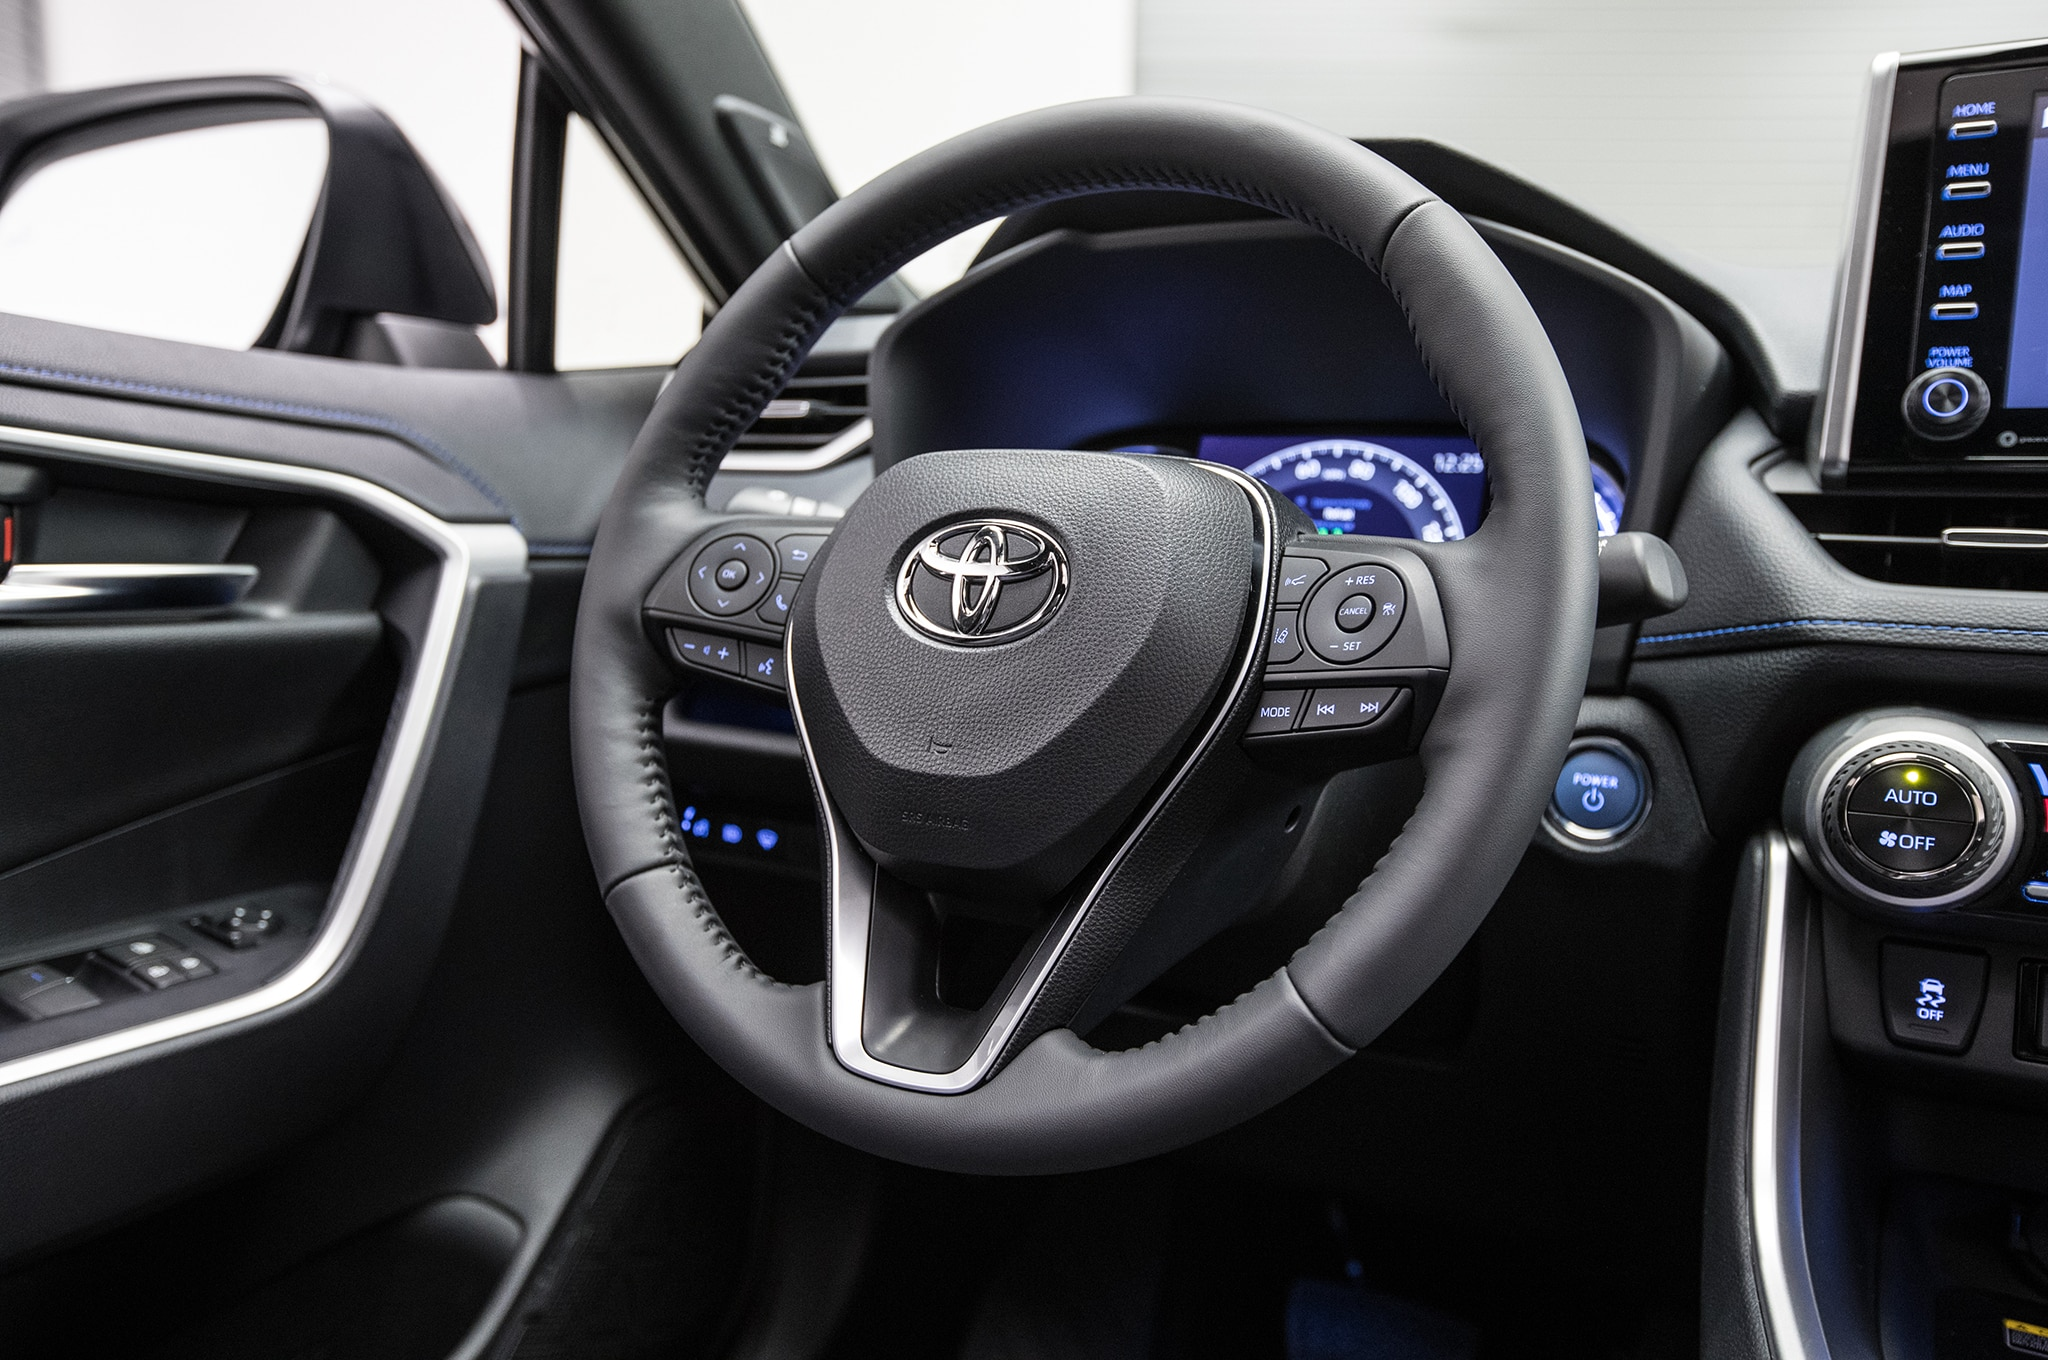 2019 Toyota Rav4 Hybrid Steering Wheel 01 2 Abril 2018 Miguel Cortina